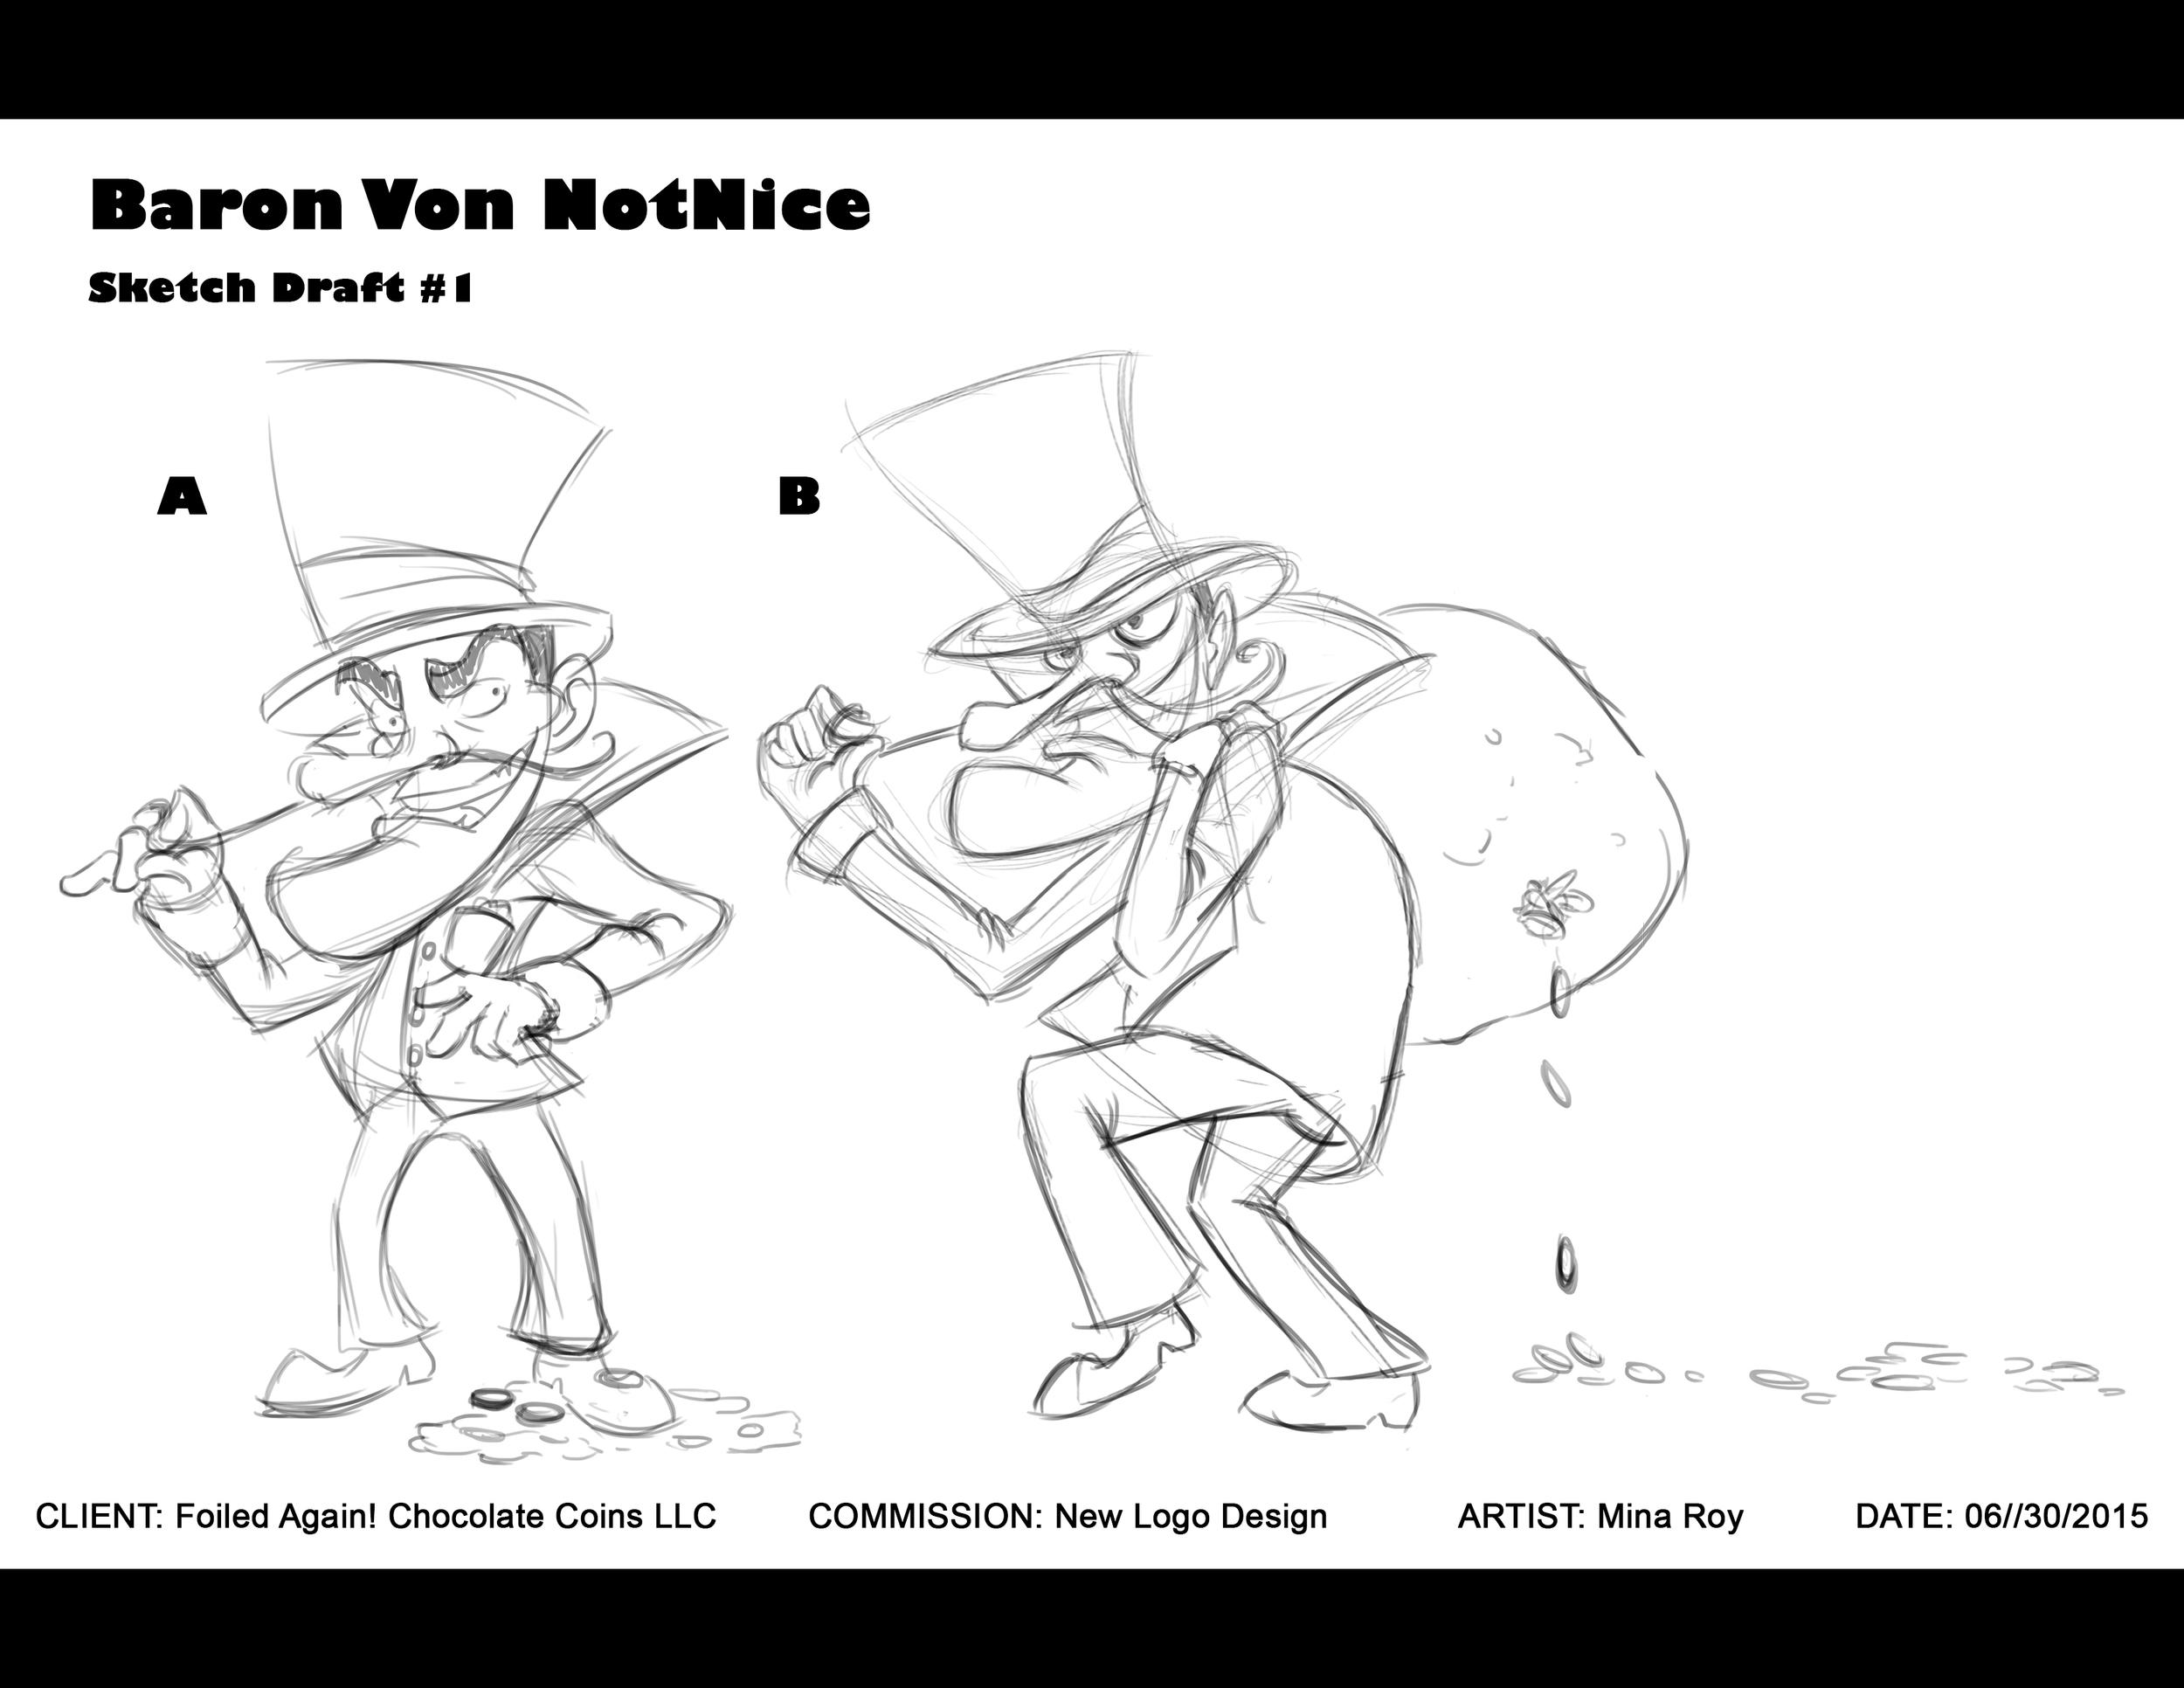 MinaRoy_FoiledAgainChocolate_Commission_S1_Baron_V2_Presentation.jpg